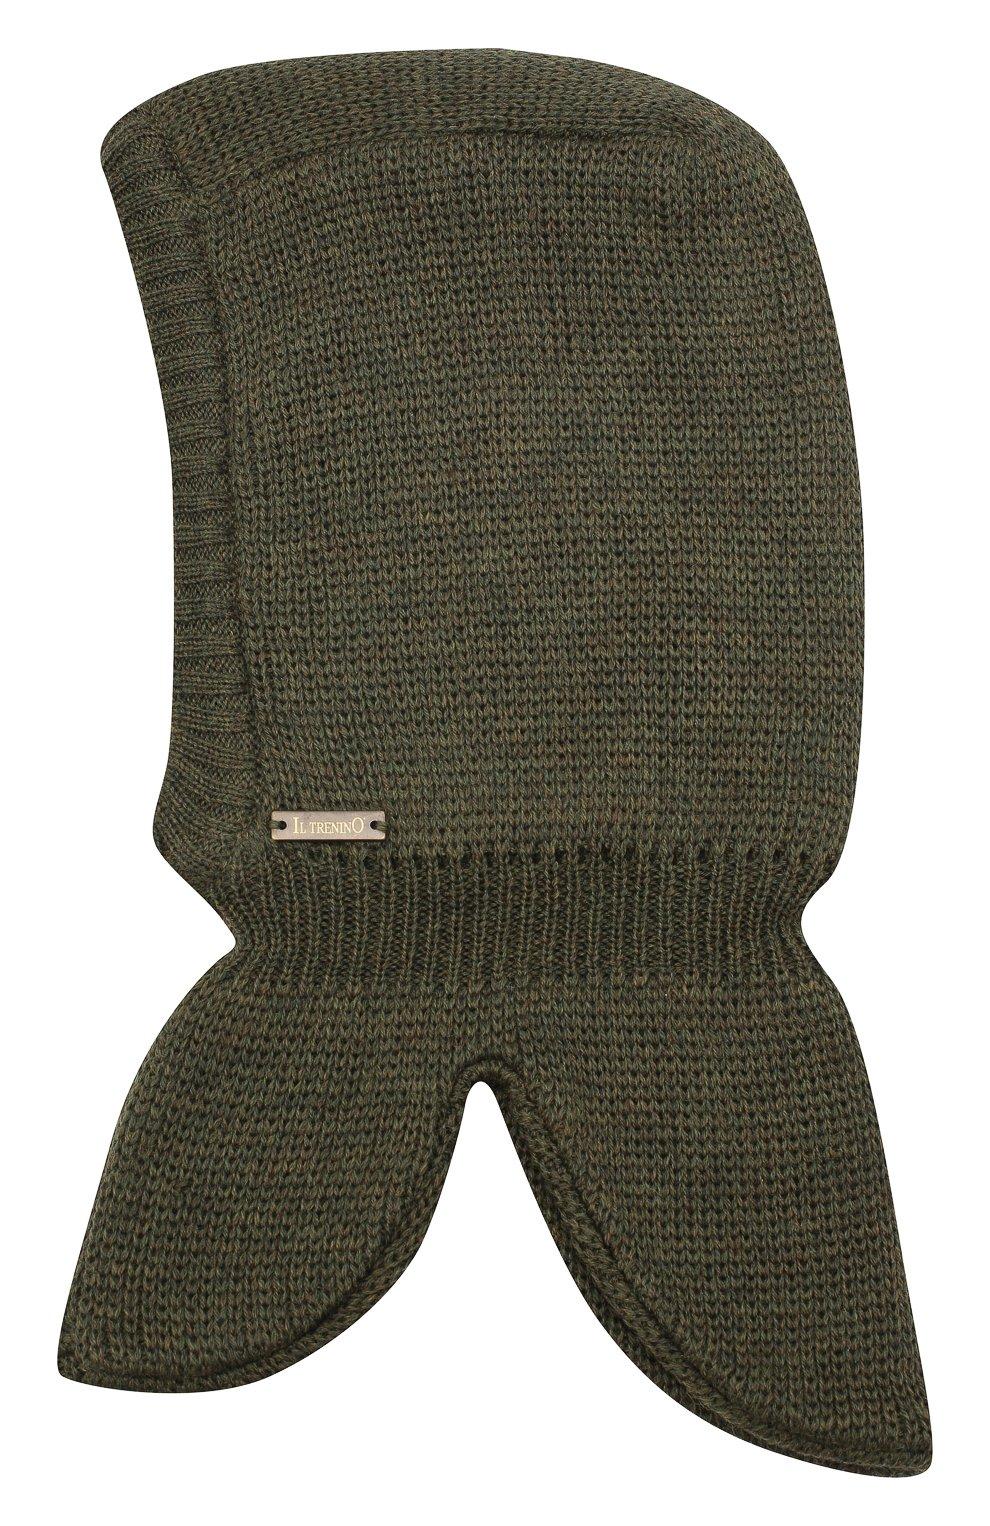 Детского шерстяная шапка-балаклава IL TRENINO хаки цвета, арт. 20 4065/E3 | Фото 1 (Материал: Шерсть)